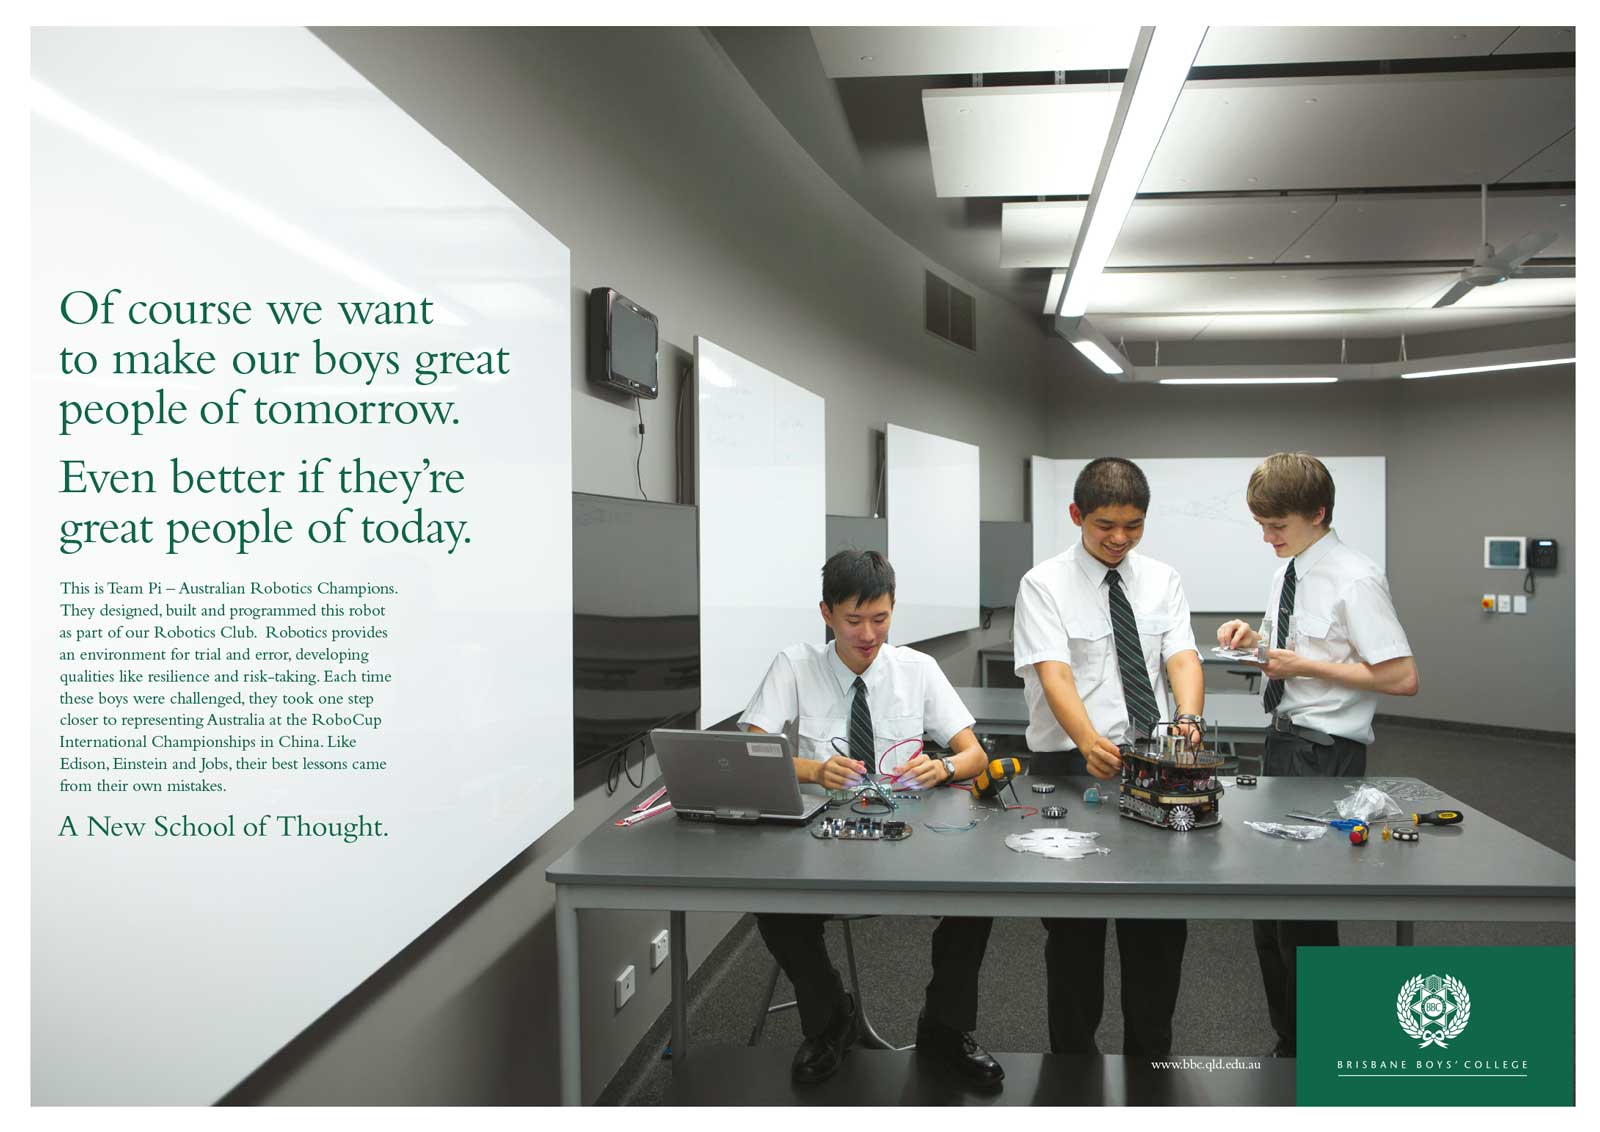 Brisbane Boys College